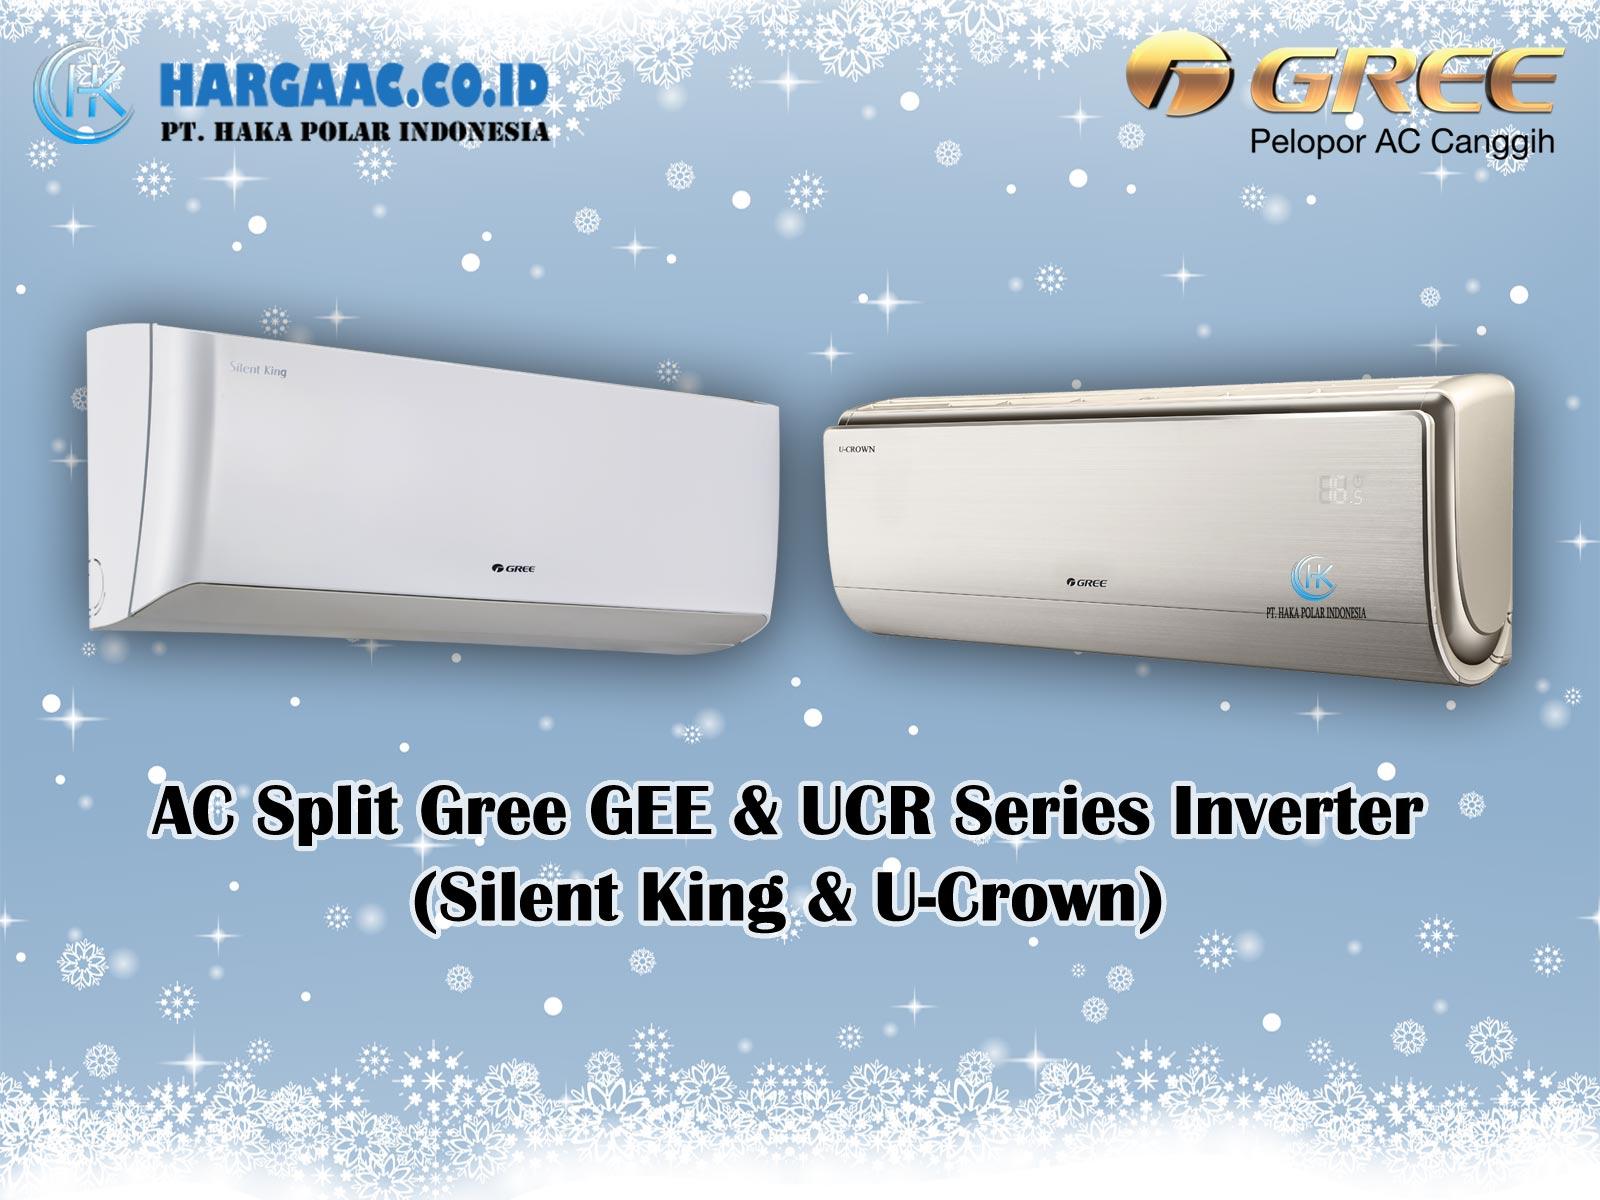 Jual AC Gree Split Inverter (Silent King & U-Crown)